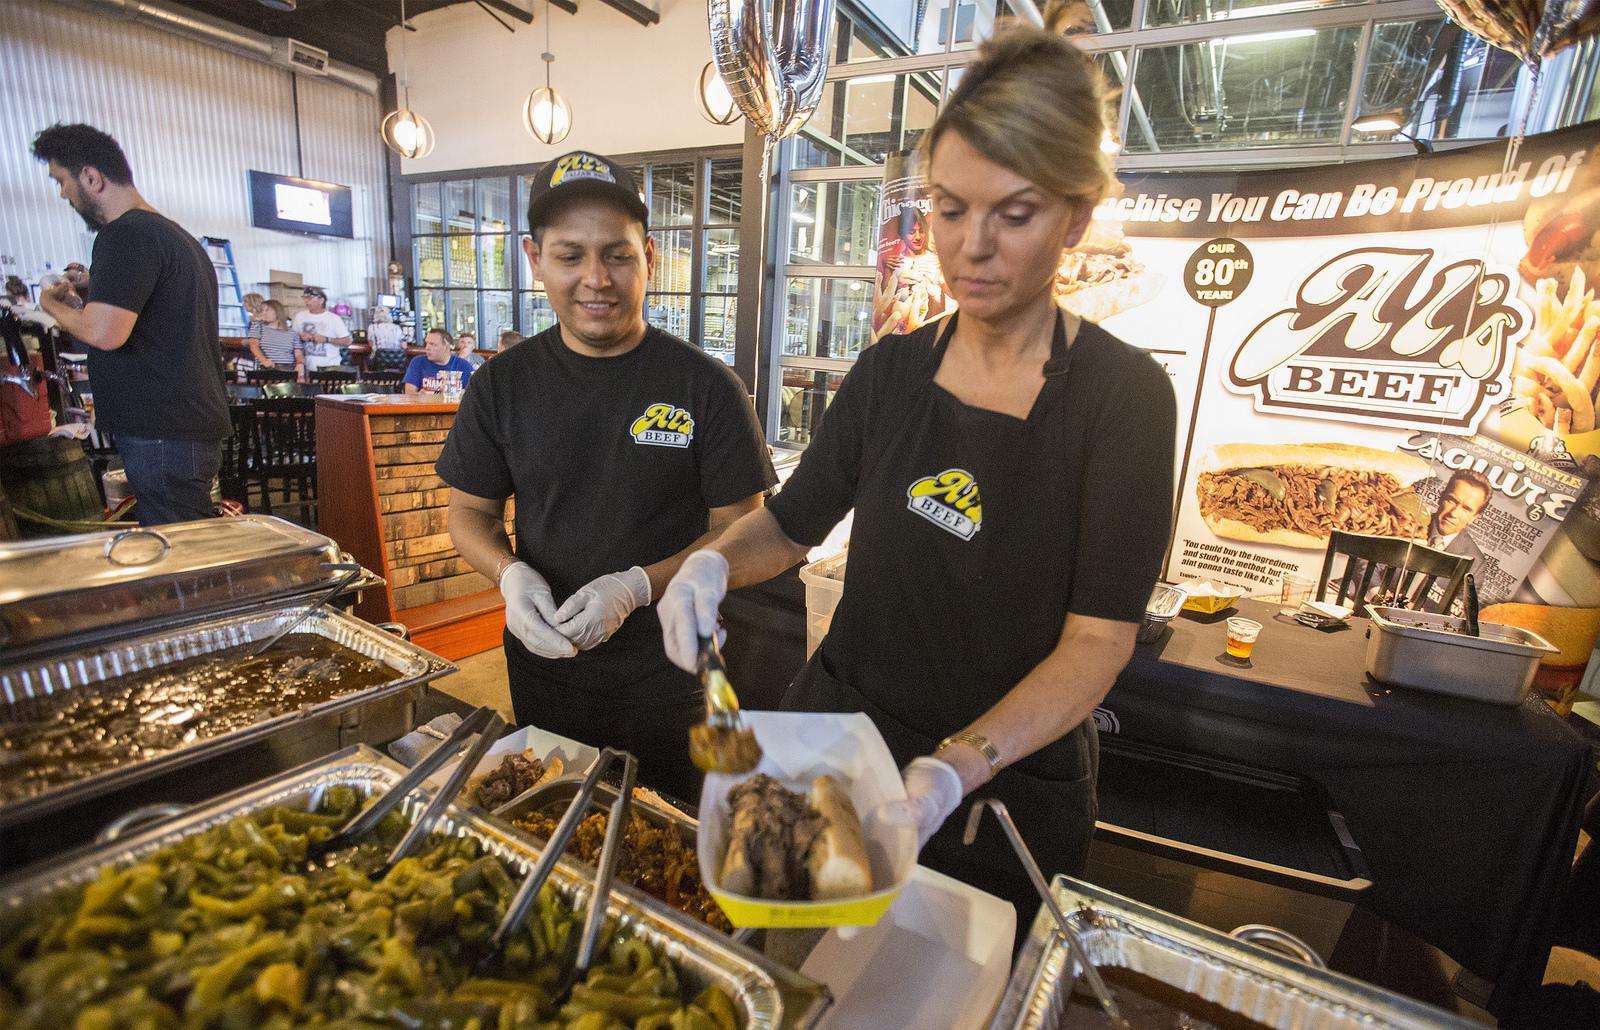 A woman serving an Italian beef sandwich